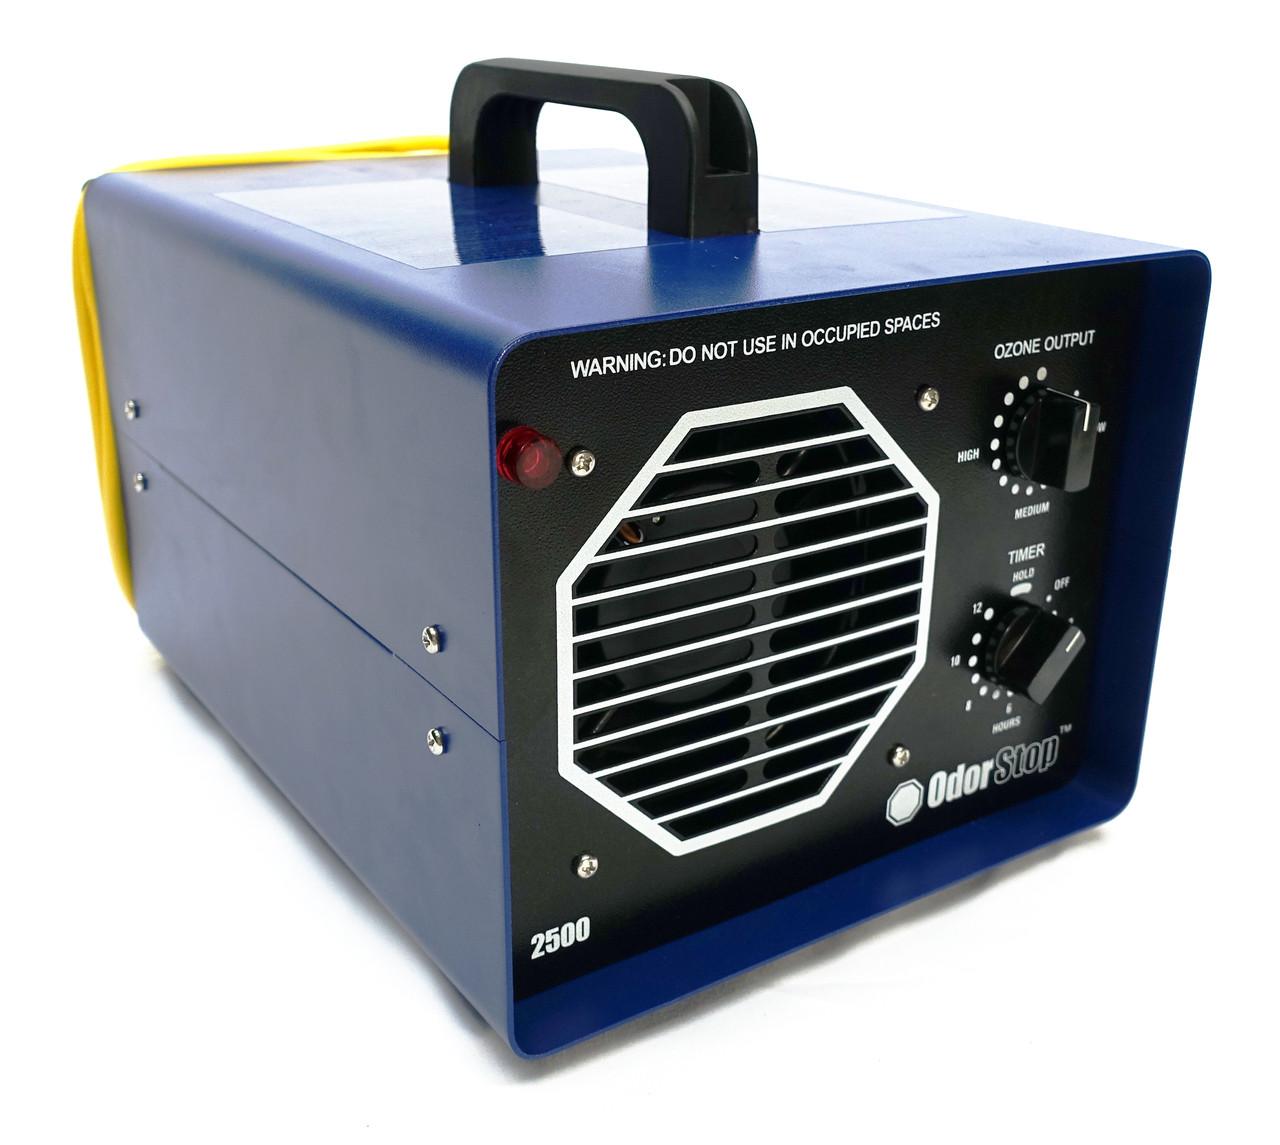 OS2500 - Ozone Generator with 2 Ozone Plates - OdorStop